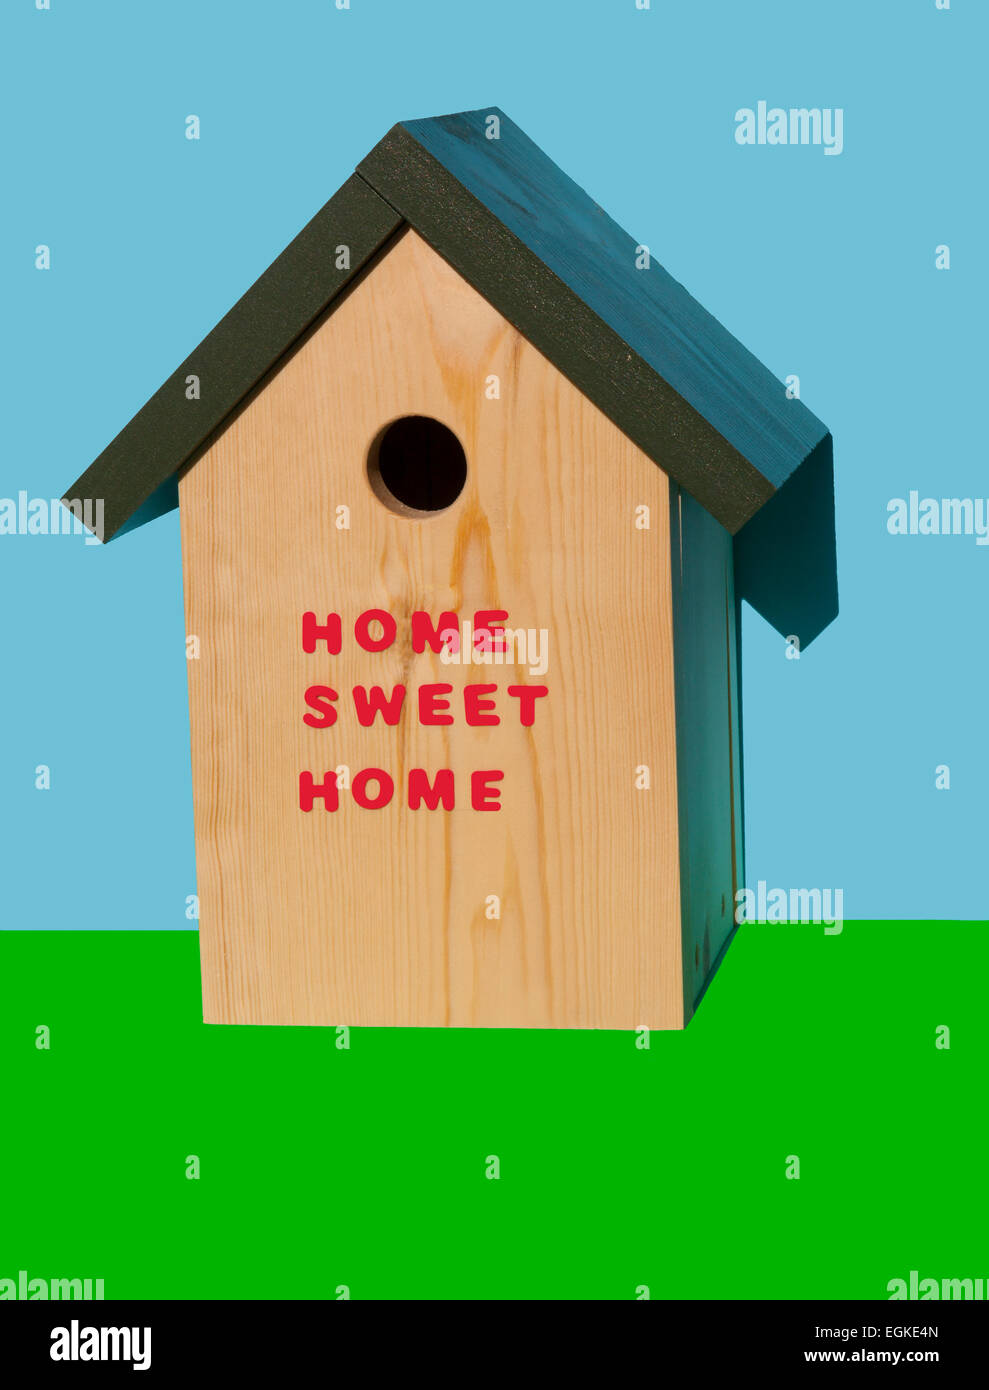 Nesting box - home sweet home - Stock Image